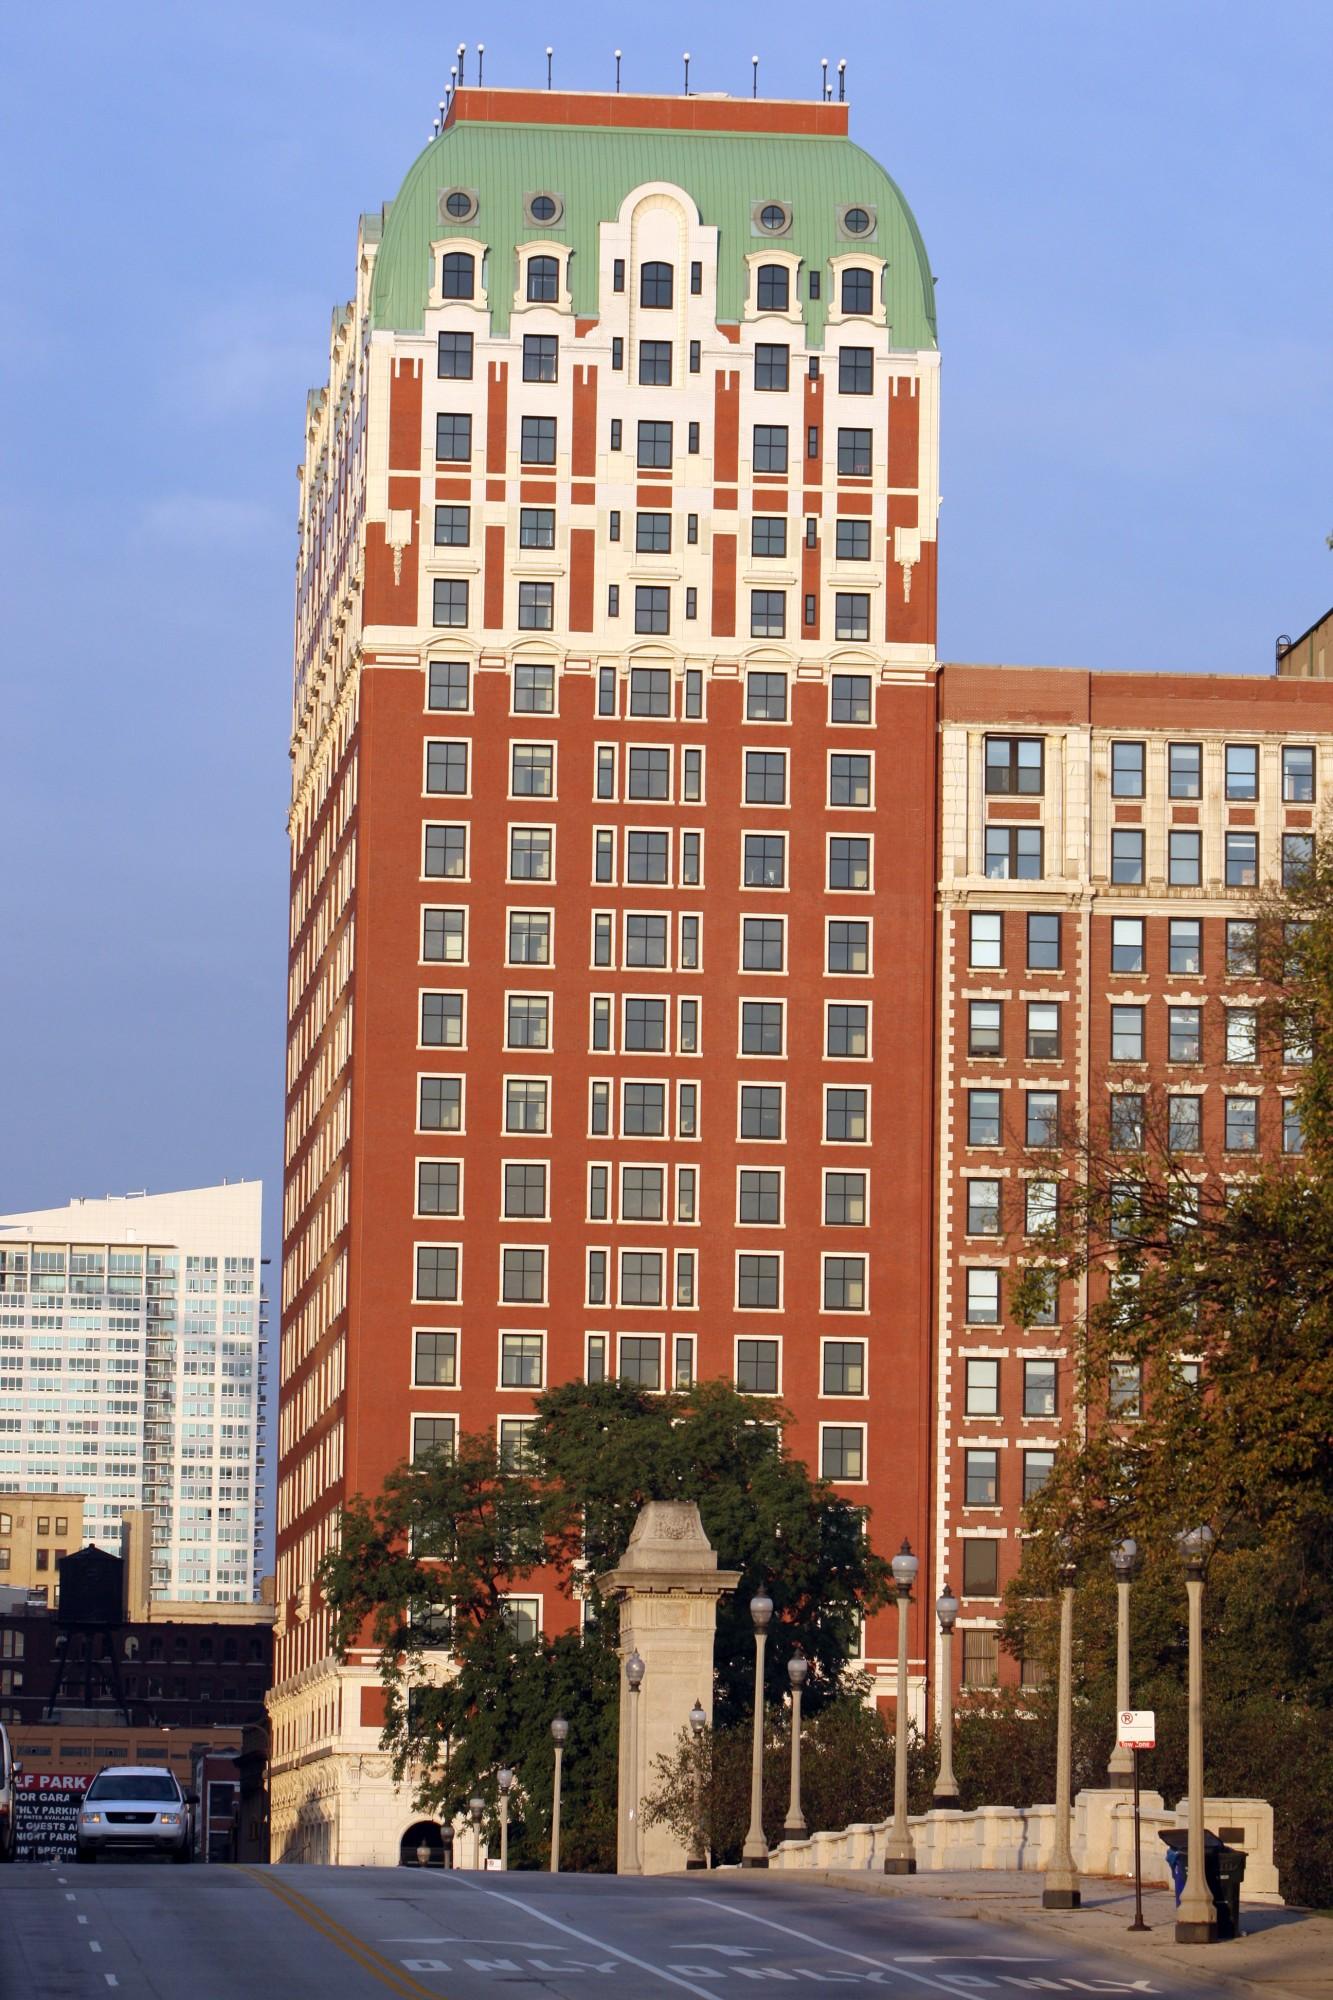 How To Unlock Amazon Account >> Meet an OHC site host: Kimberly Corrigan of the Blackstone Renaissance Hotel · Chicago ...